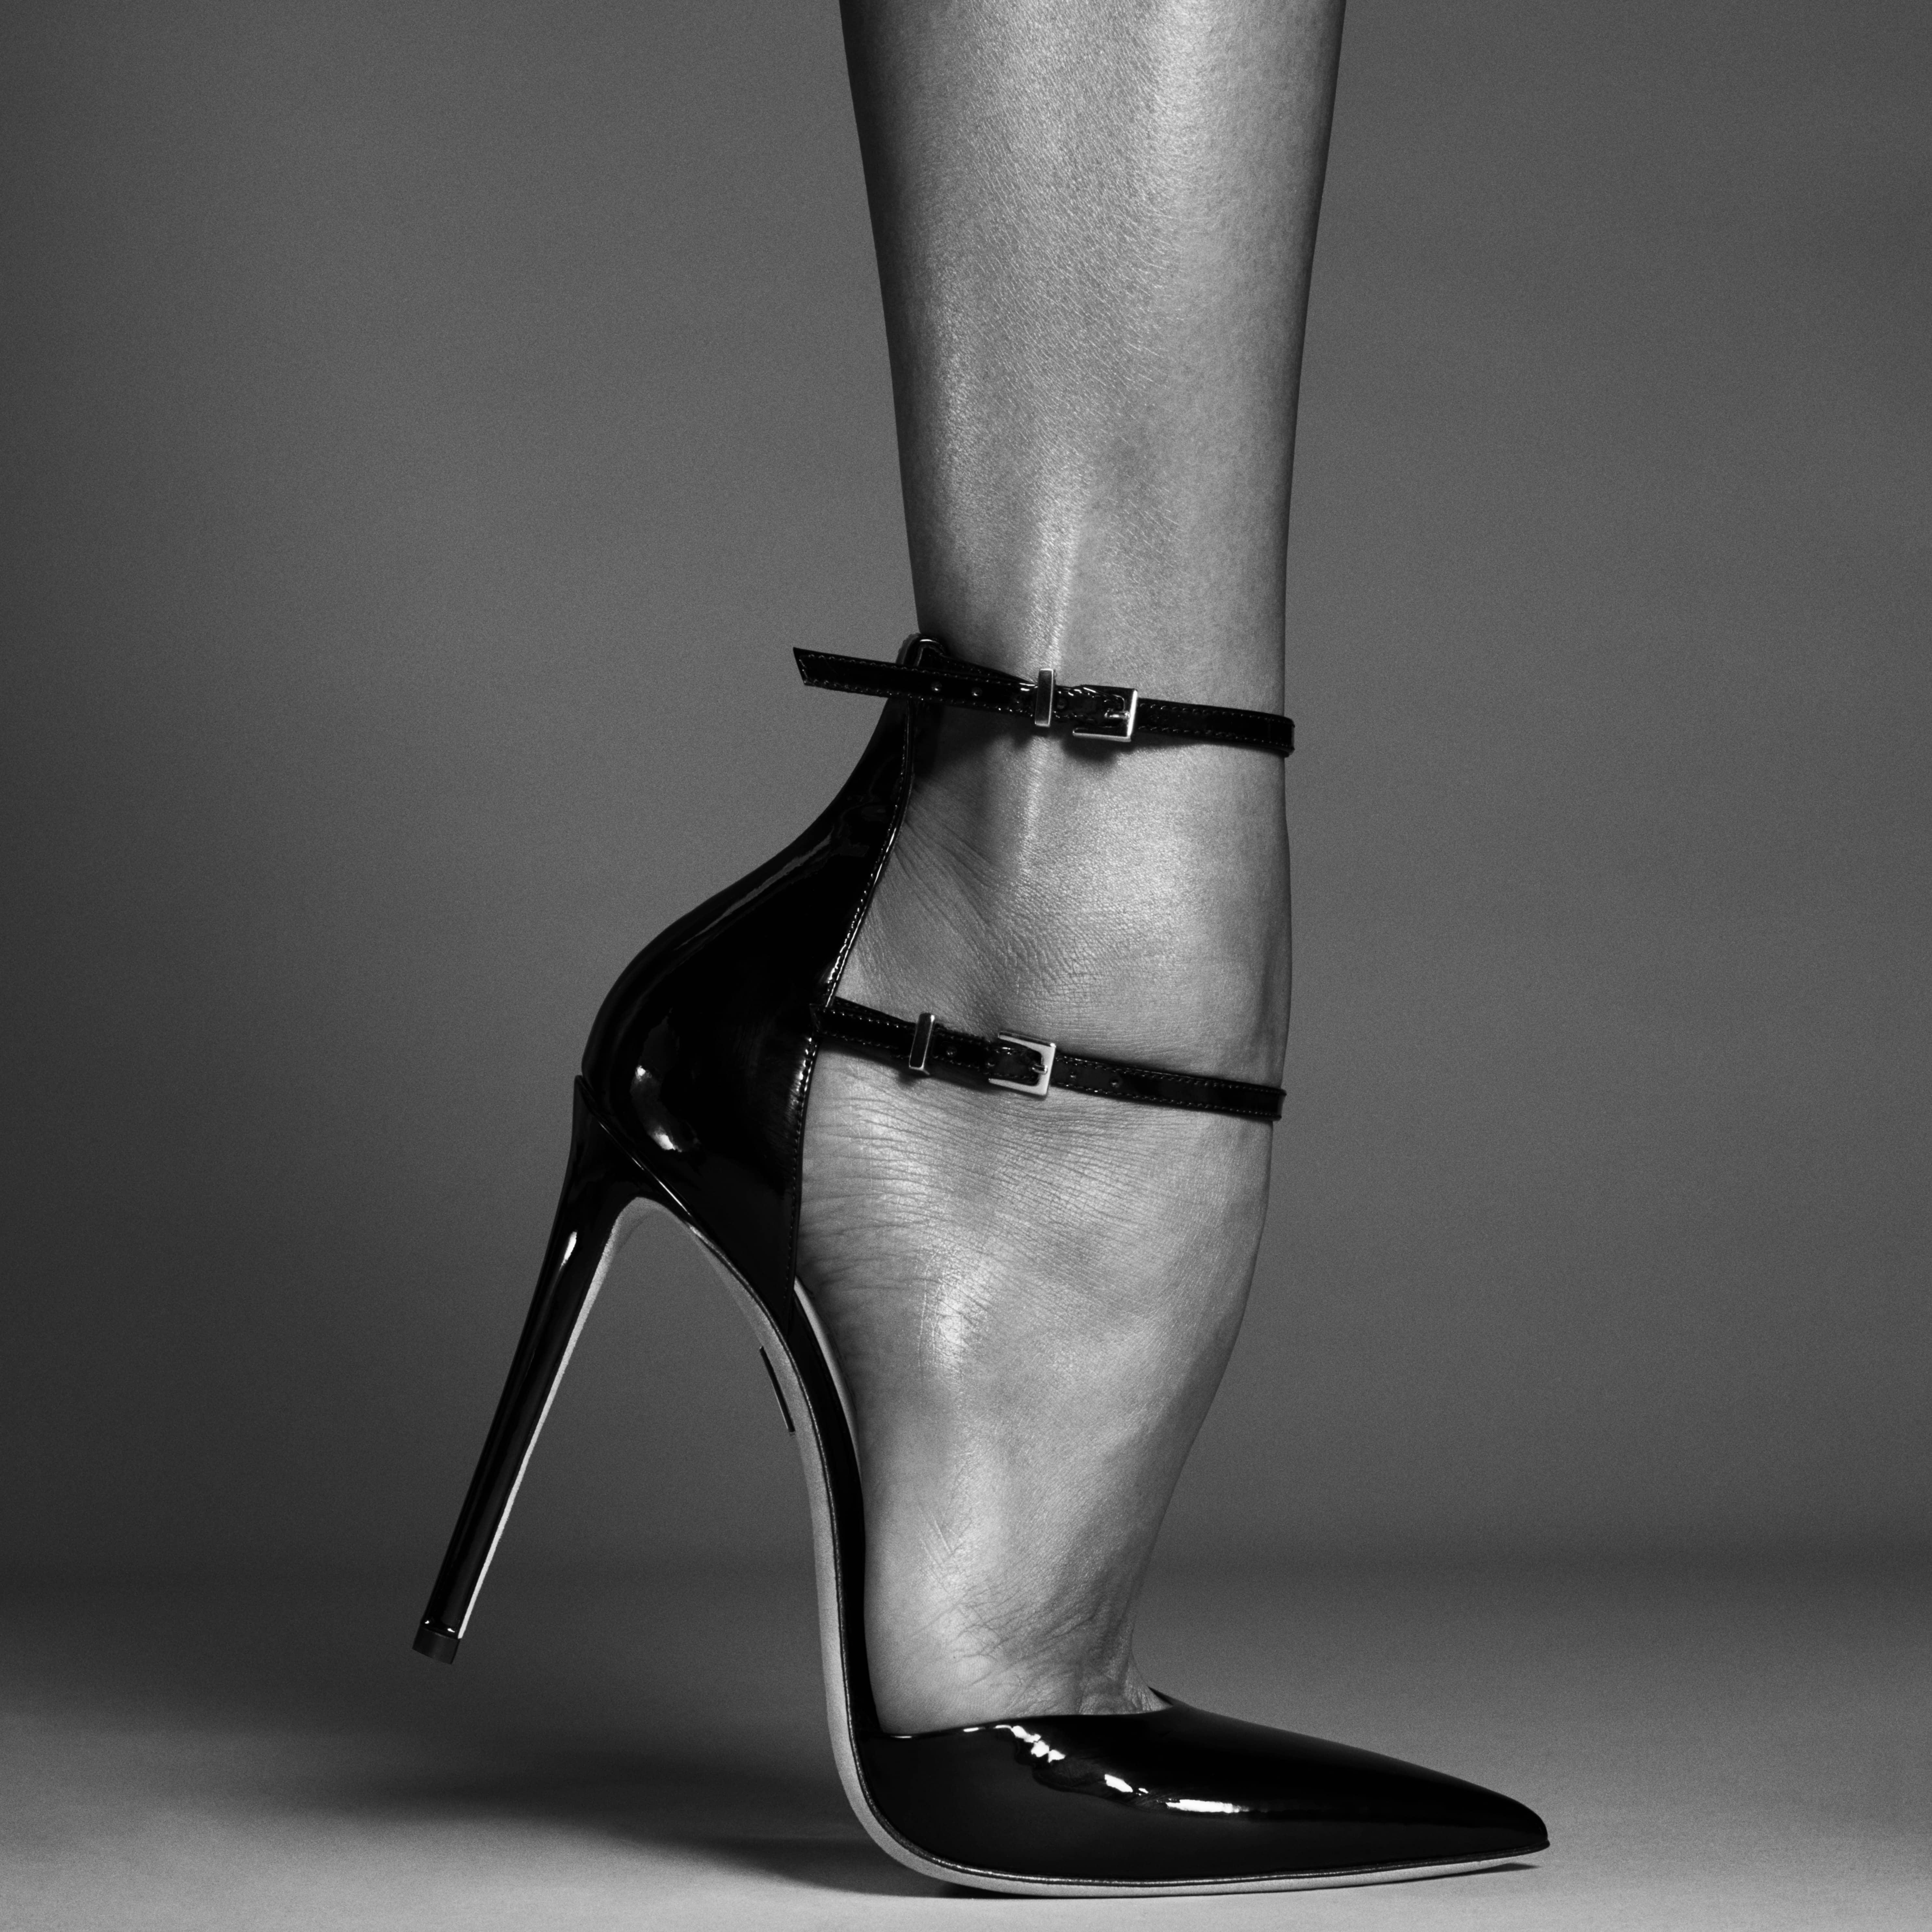 Tamara Mellon Rendezvous Shoe